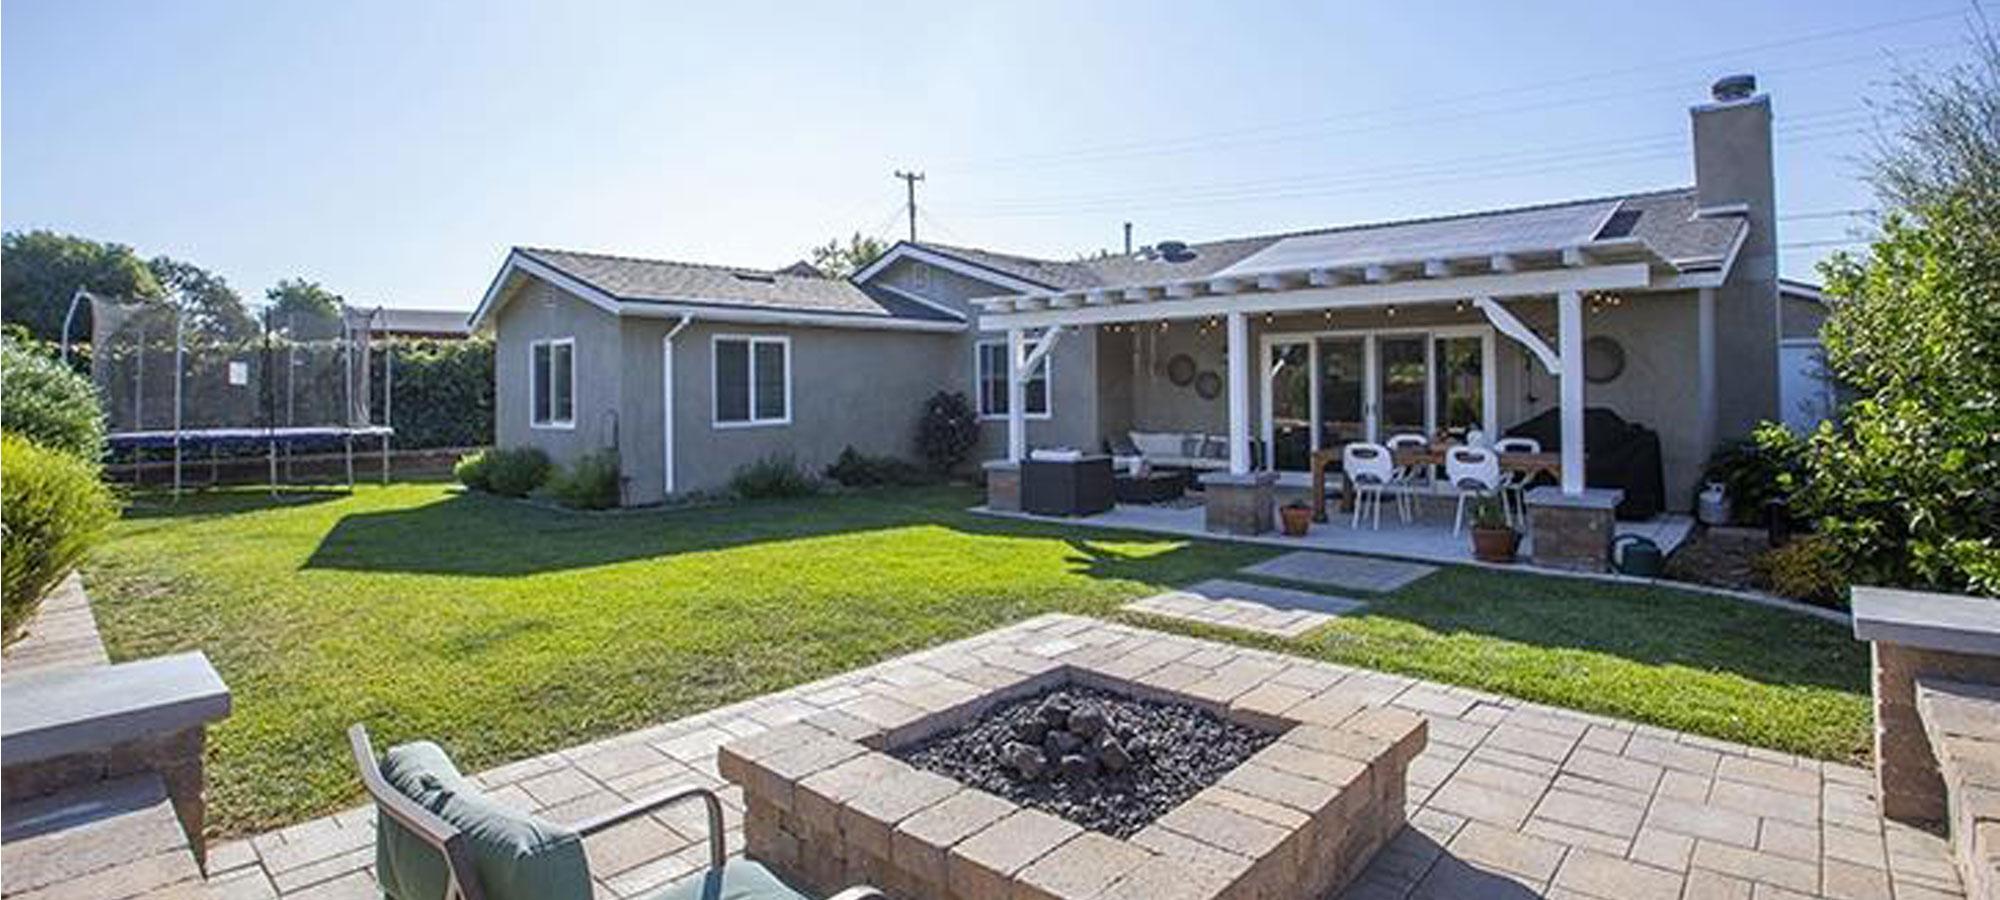 6393 Badger Lake Ave. San Diego, CA 92119